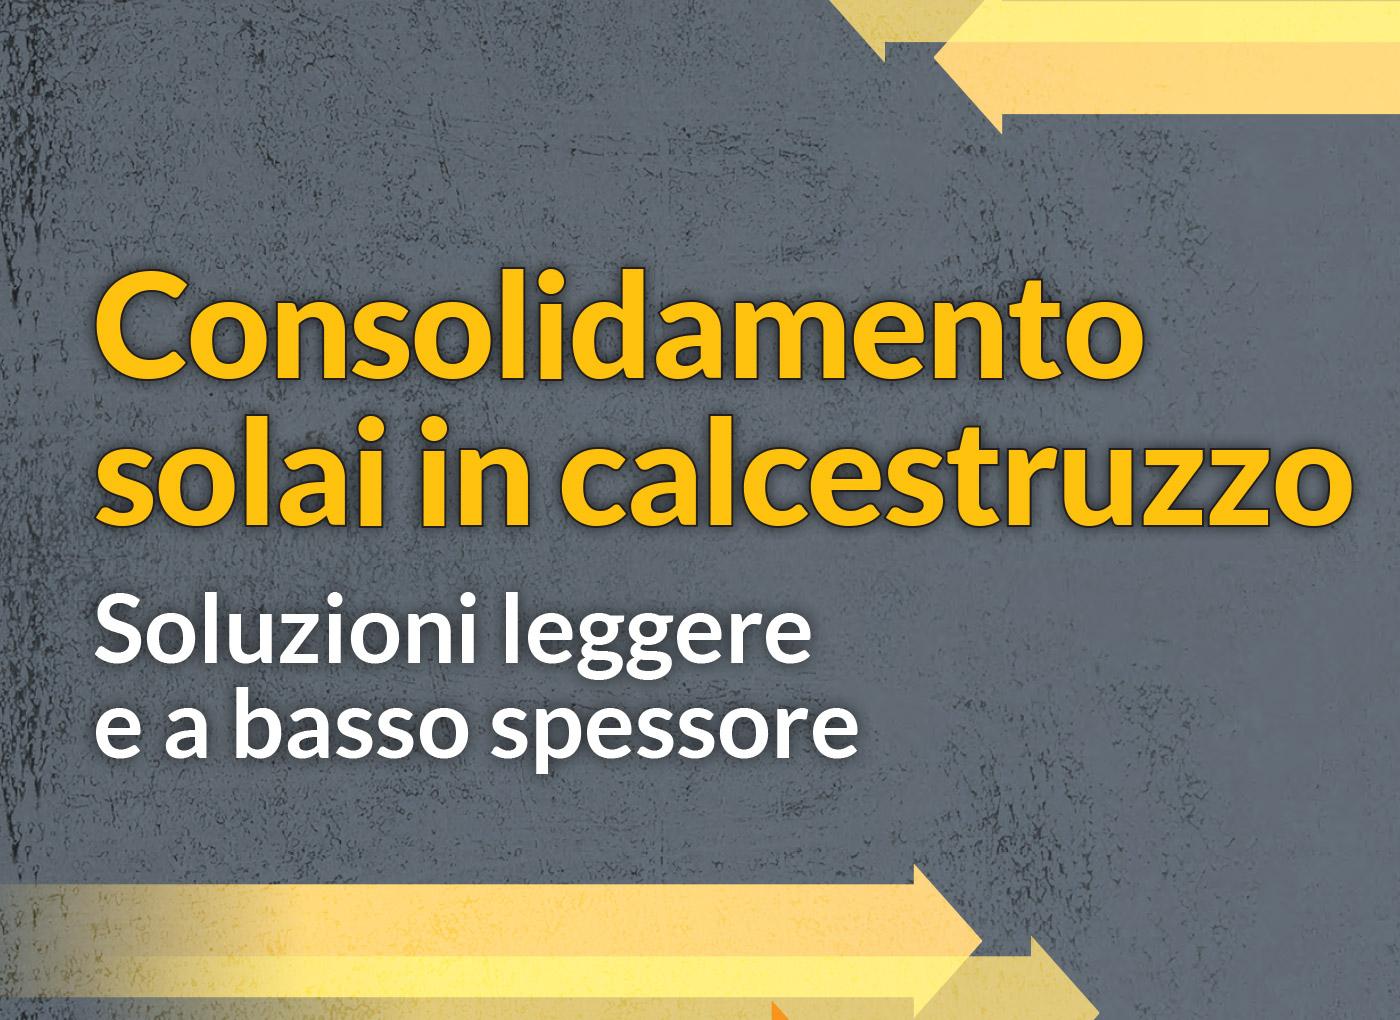 brochure-consolidamento-solai-in-calcestruzzo-laterocemento